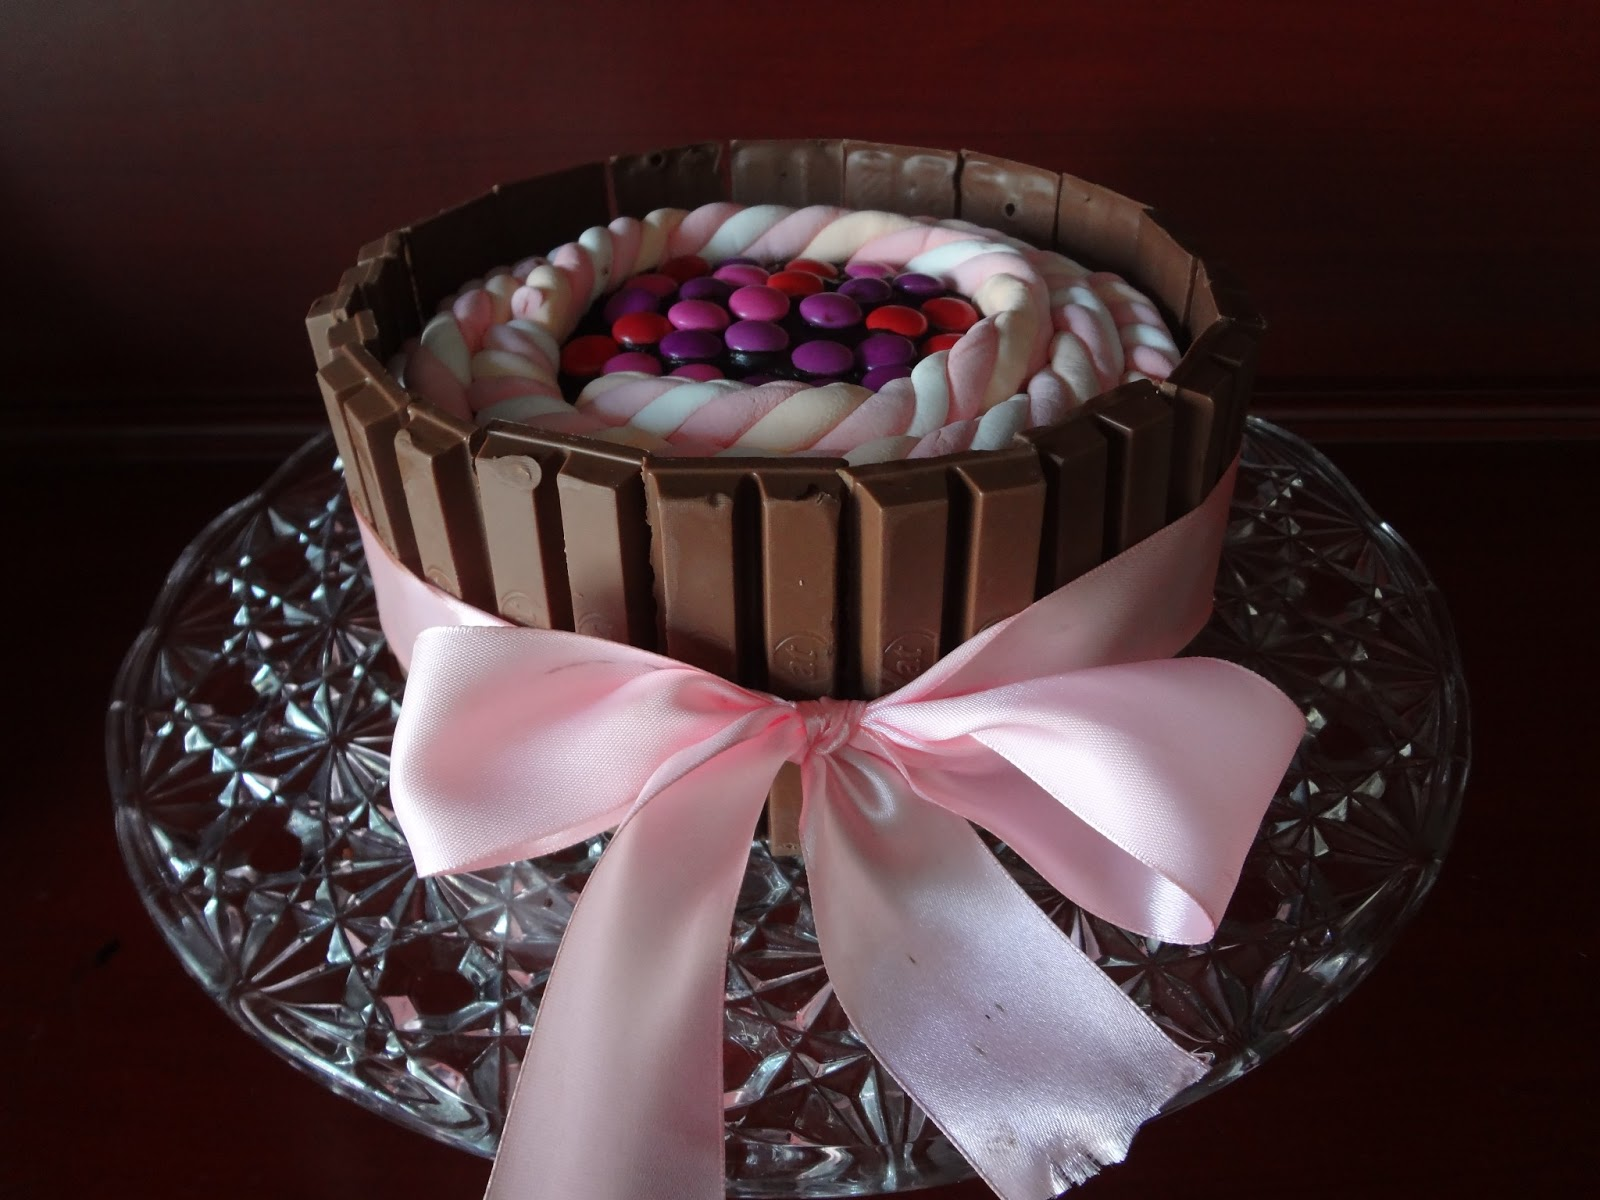 Shocks And Shoes A Kit Kat Birthday Cake